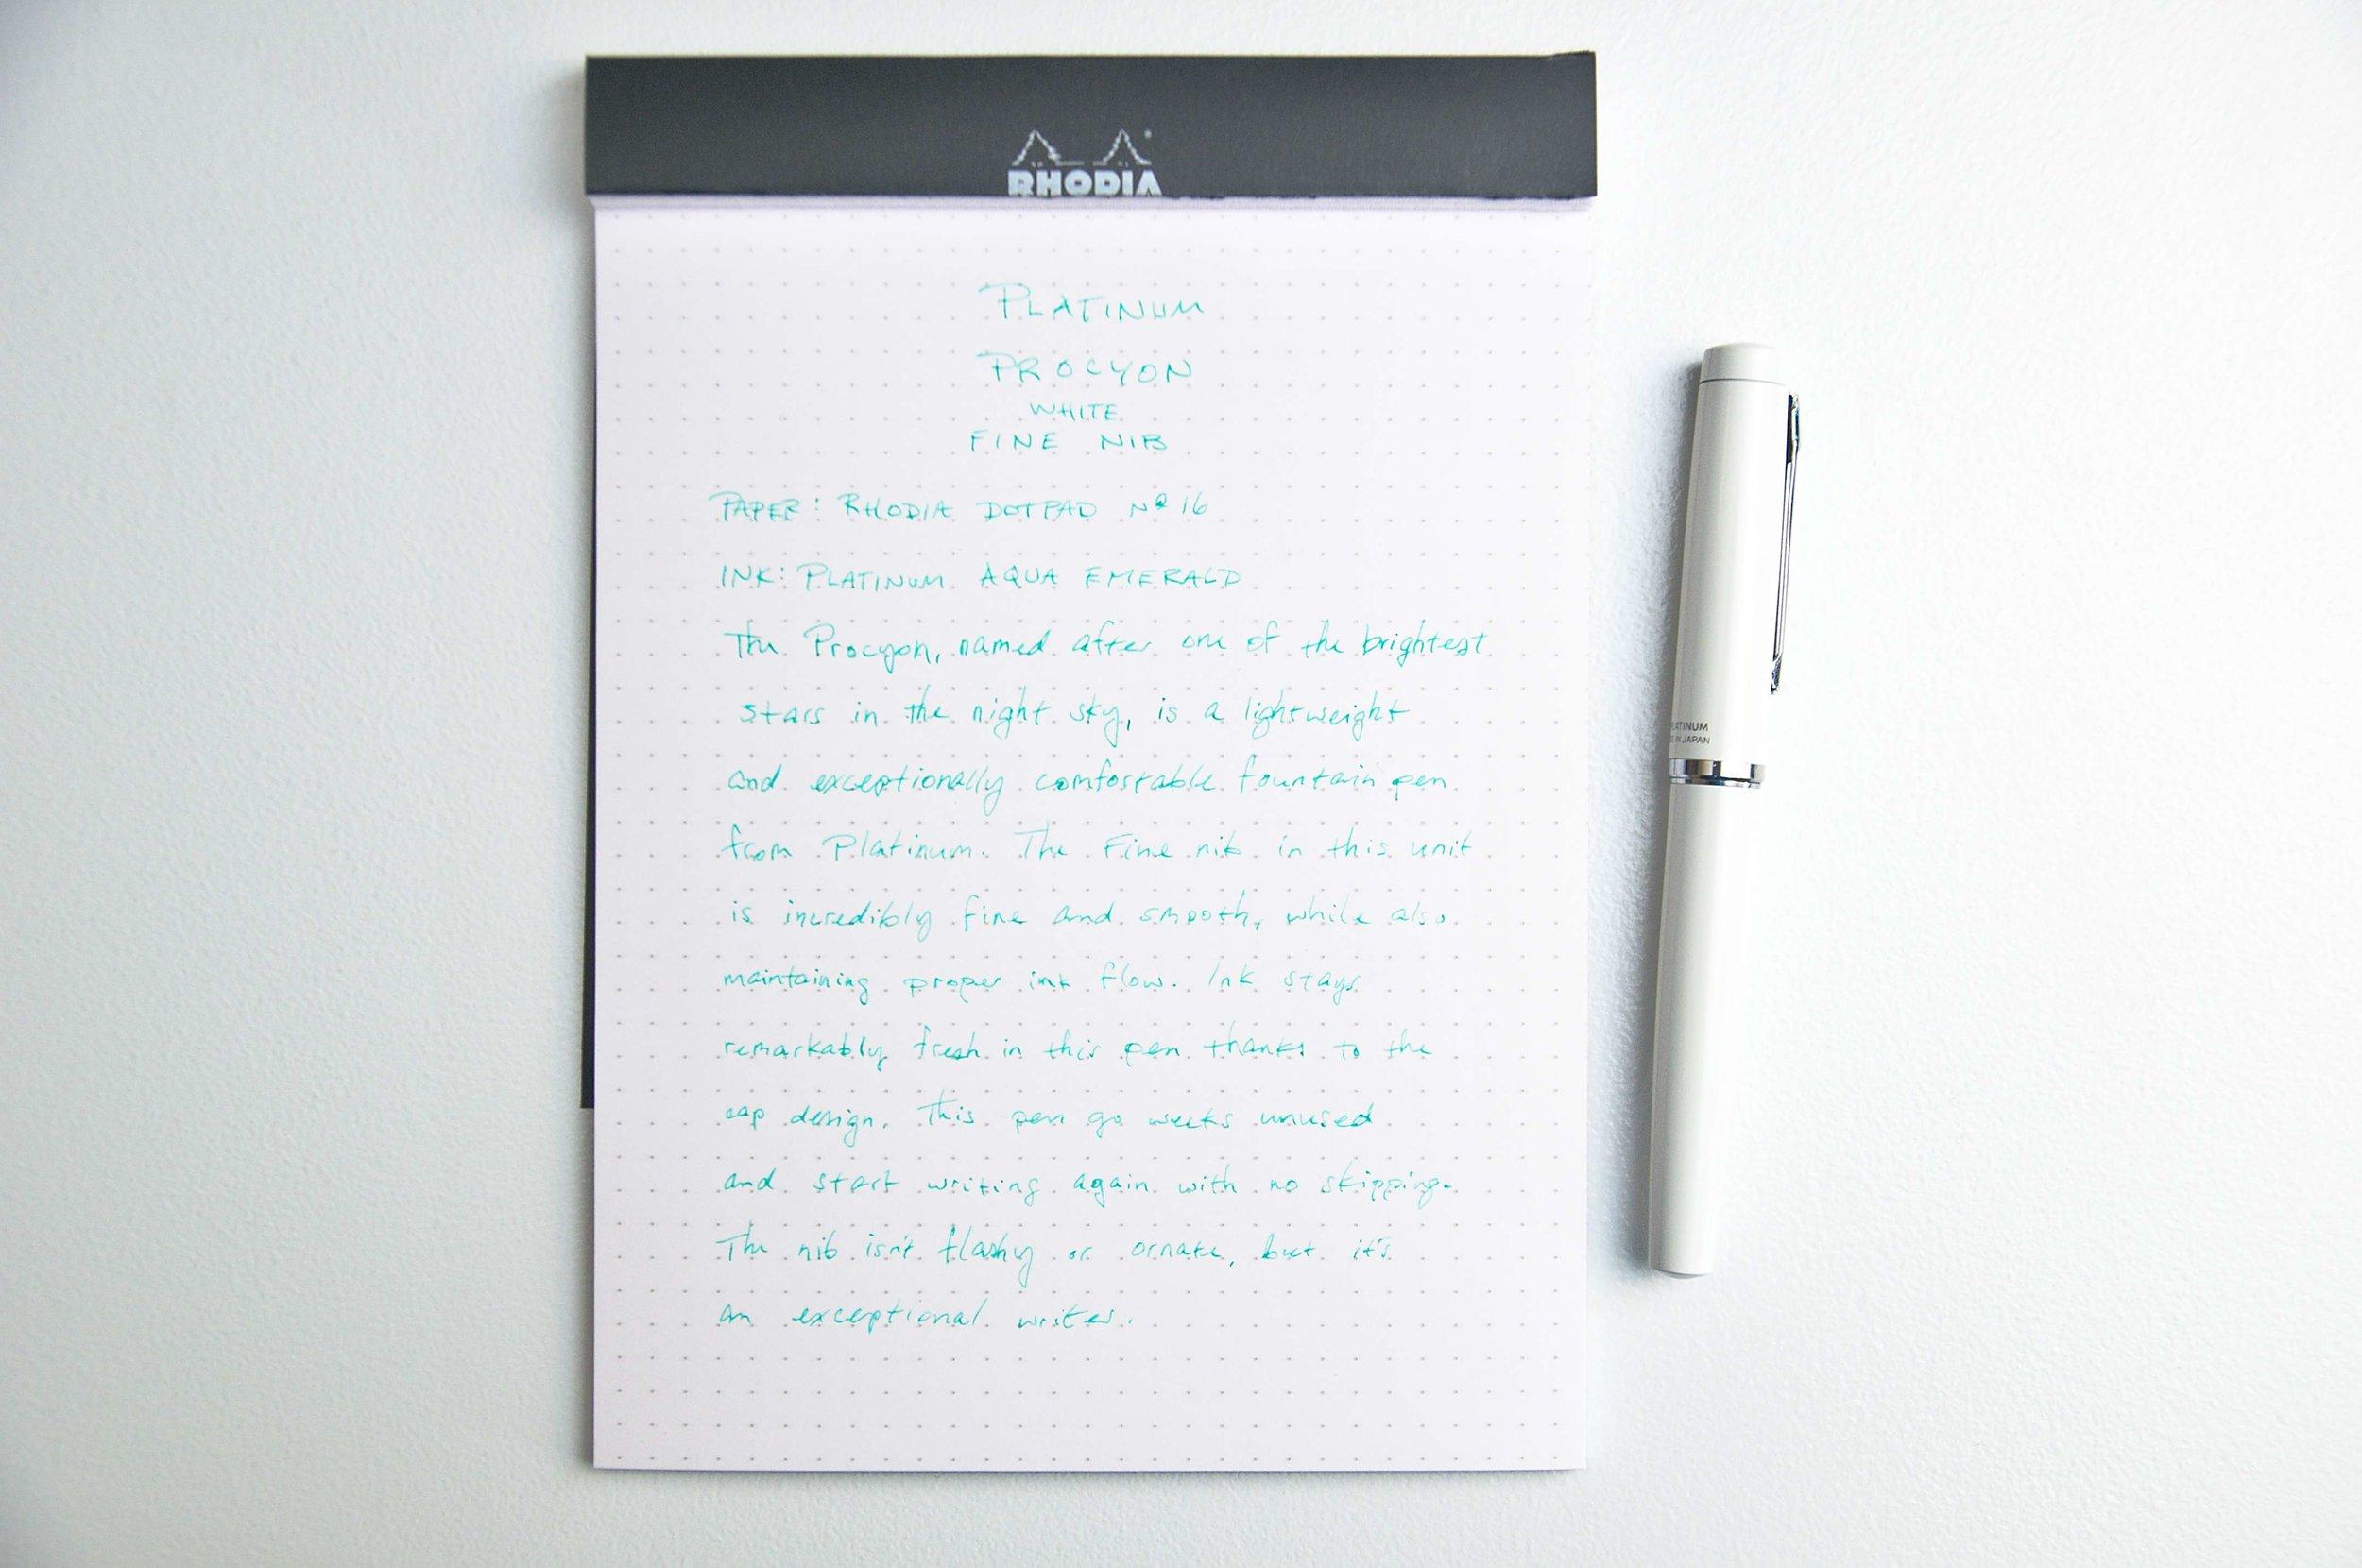 Platinum Procyon Fountain Pen Writing